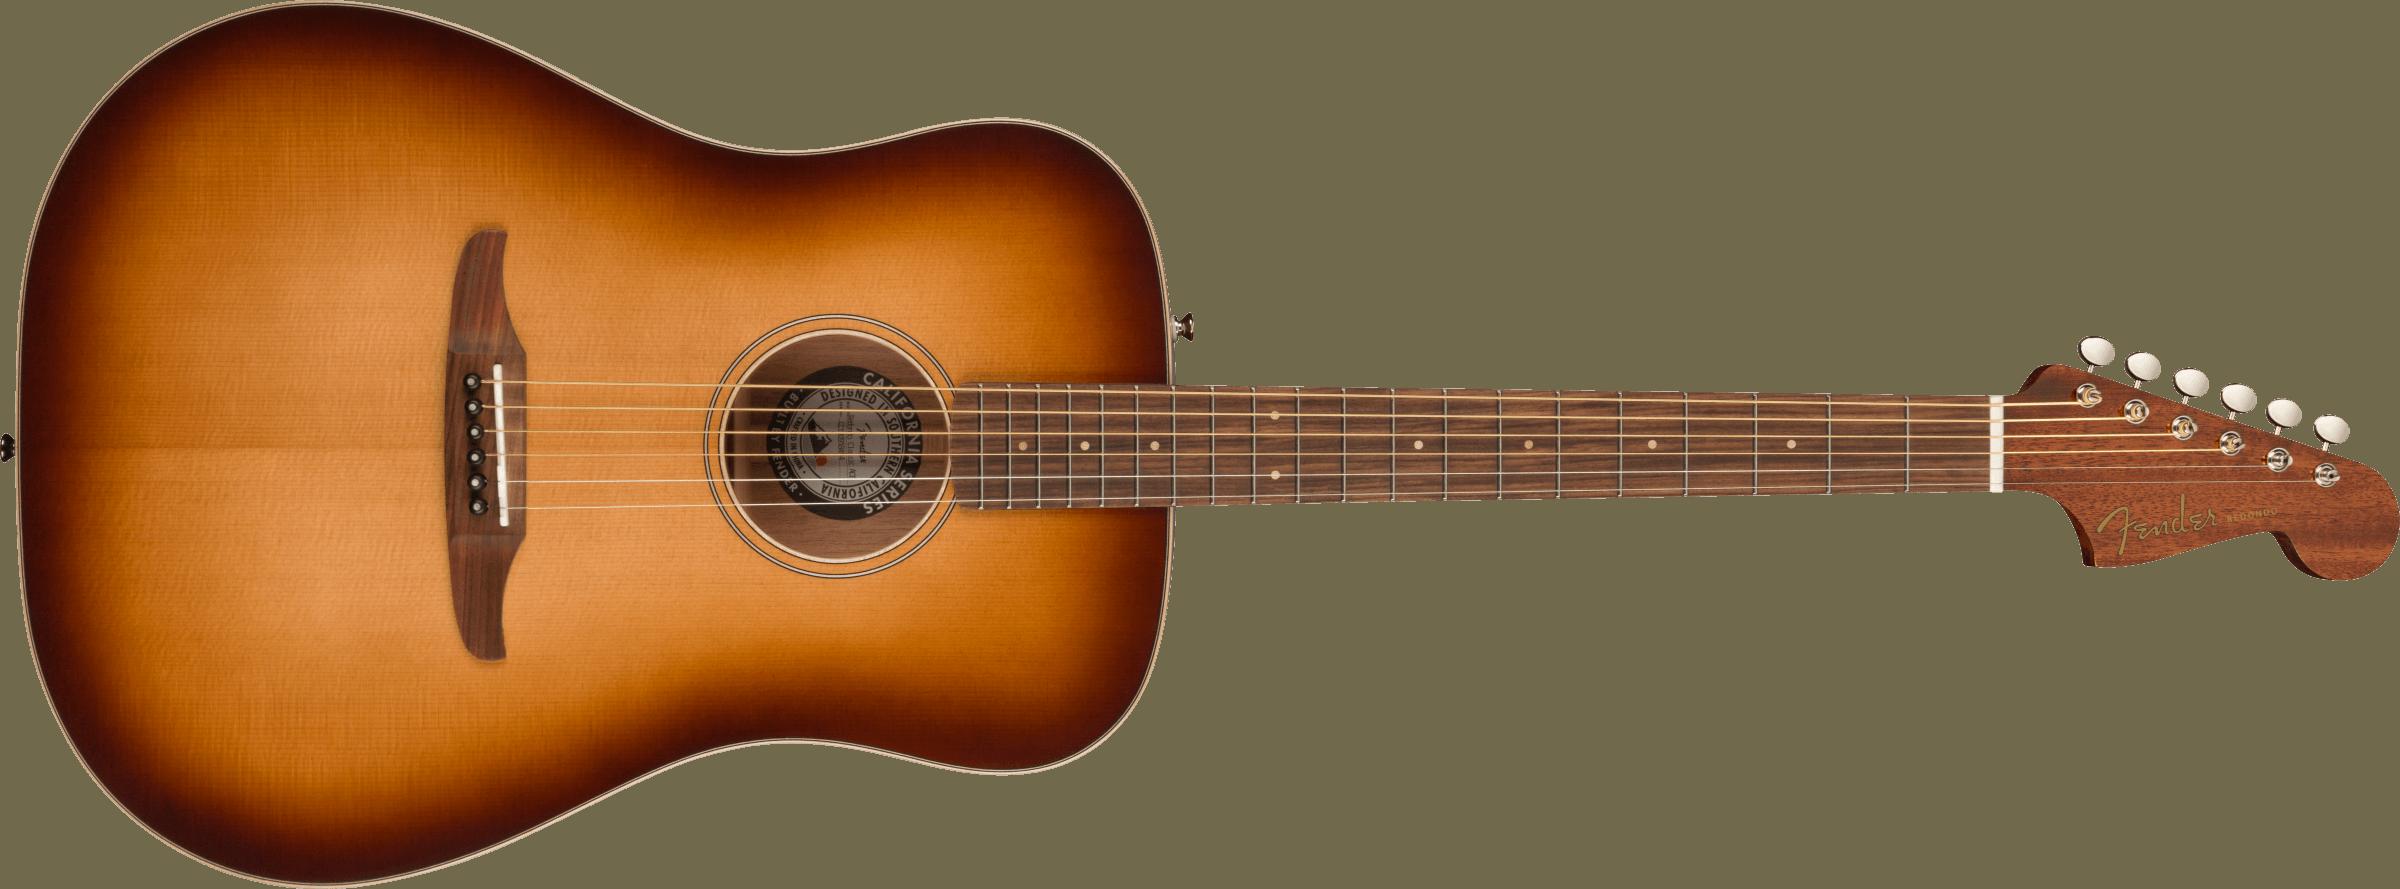 FENDER-Redondo-Classic-Pau-Ferro-Fingerboard-Aged-Cognac-Burst-sku-571004887